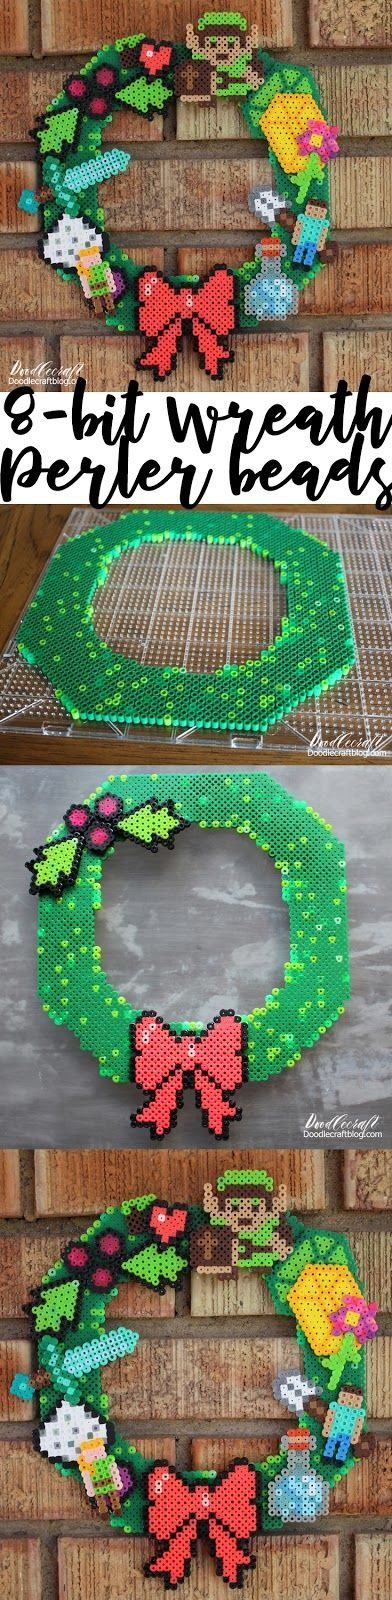 Perler Bead Wreath DIY #PerlerBeads #Christmas #christmasdecor